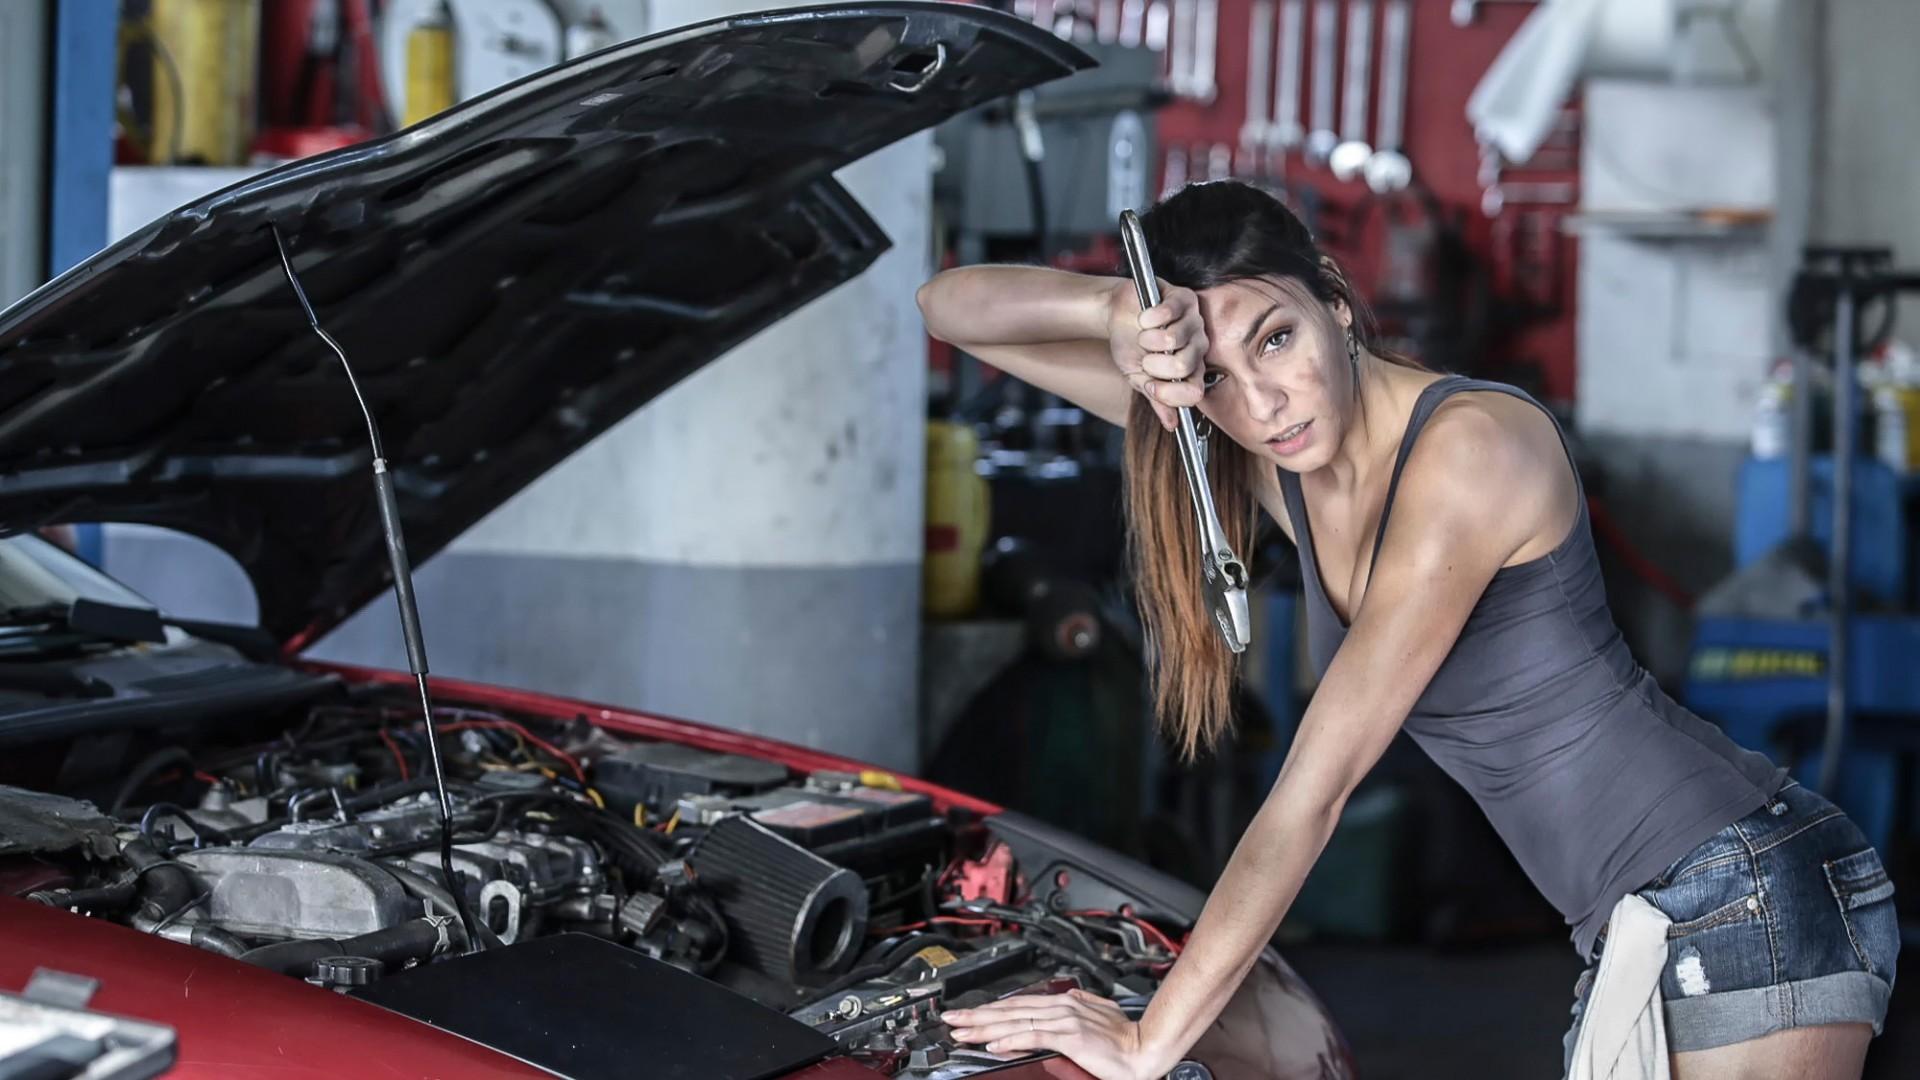 Women Model Car Vehicle Women With Cars Engines Sports Car Engine Wheel  Supercar Mechanic Automobile Make